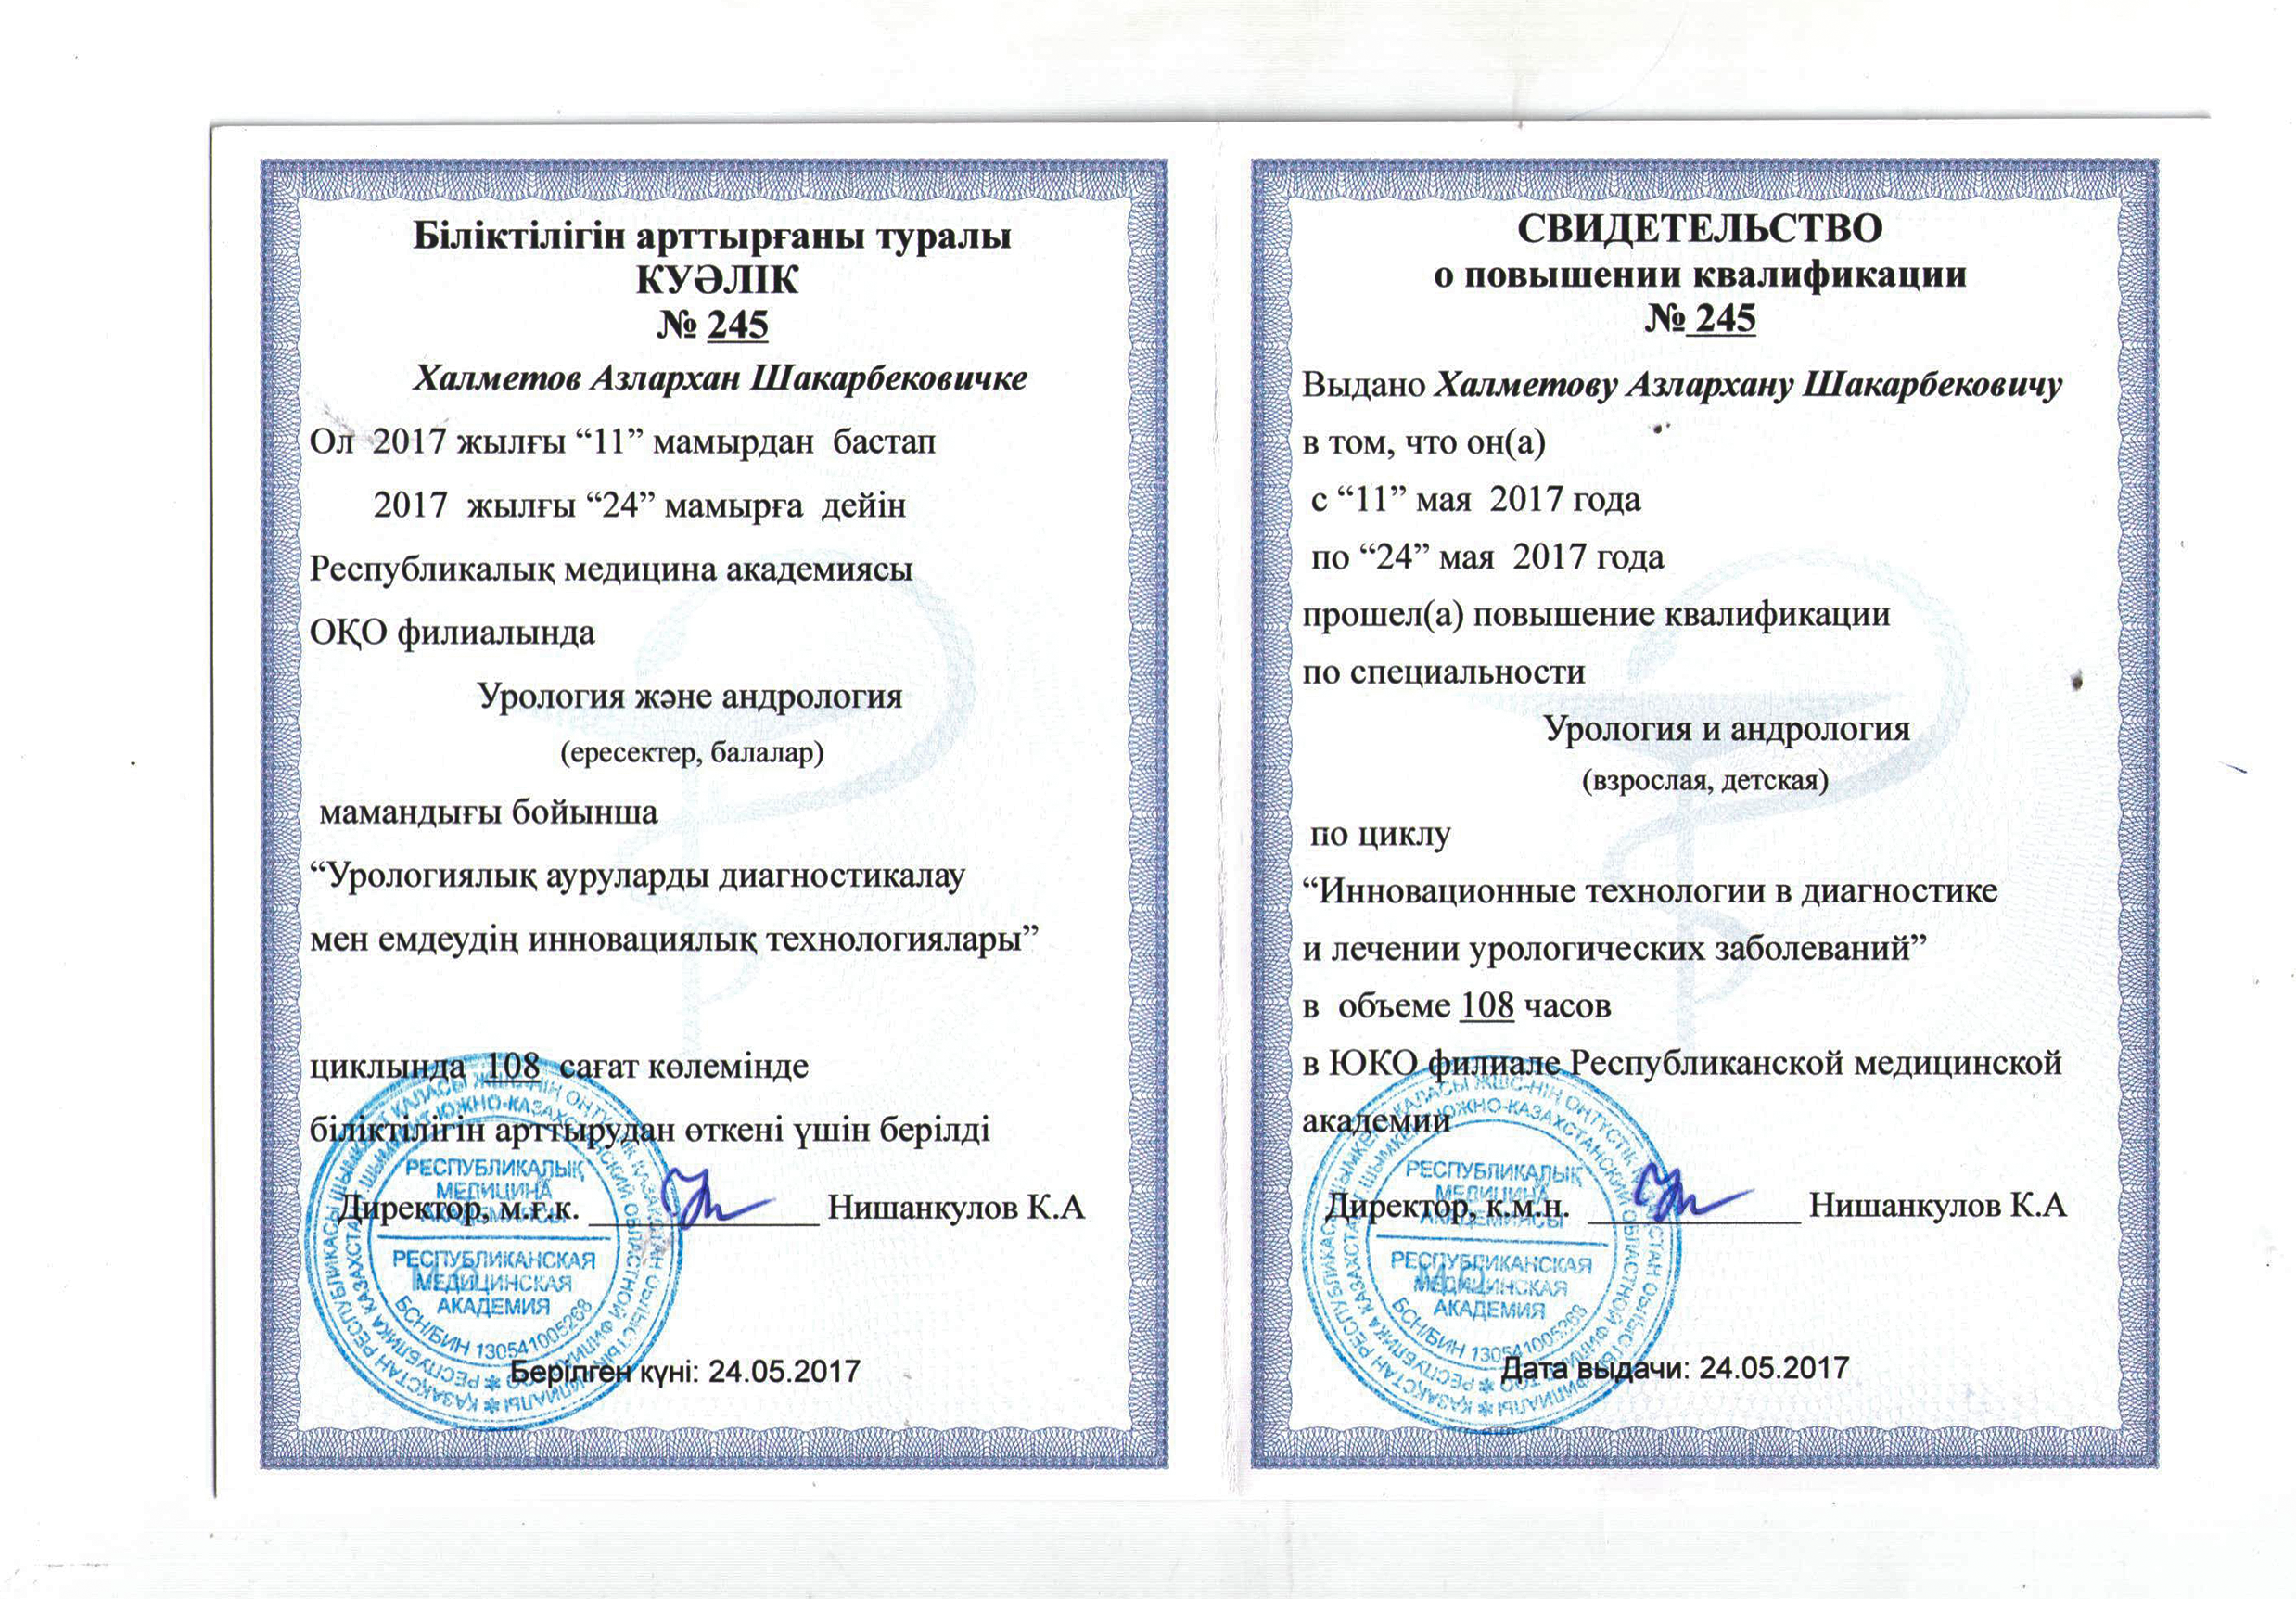 Первичка Уролога клиники Akniet Shipa сайрамский р-н. с. Карабулак